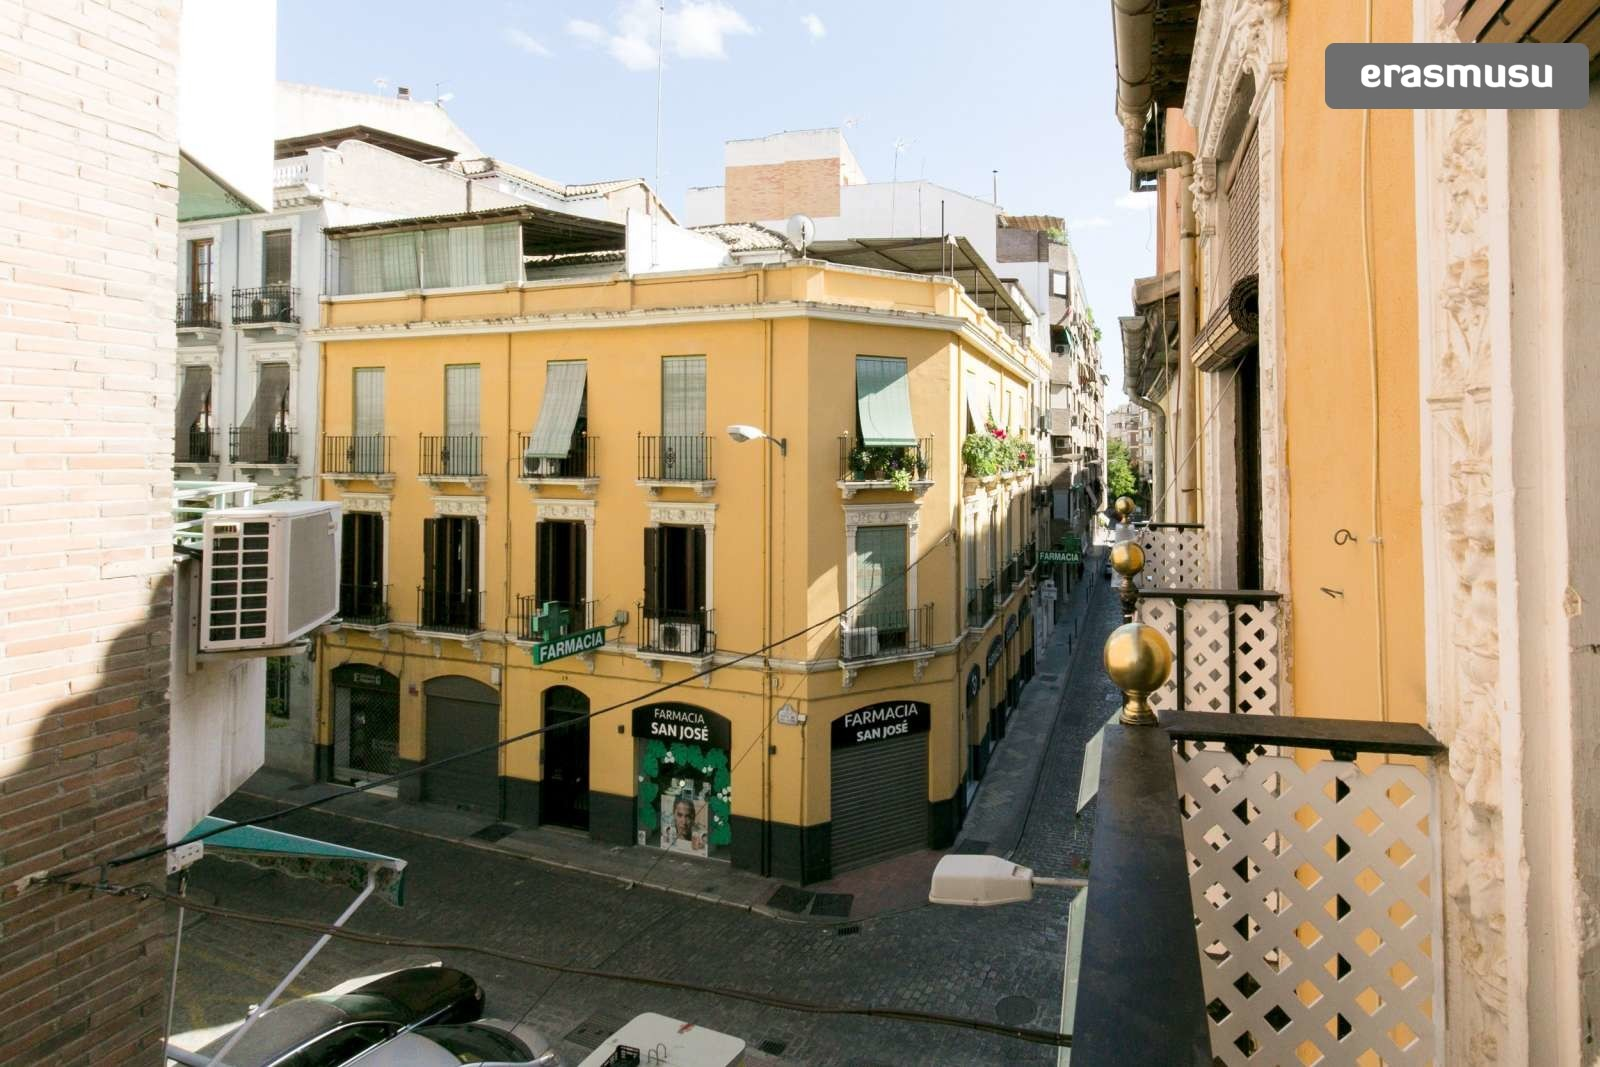 spacious-3-bedroom-apartment-rent-realejo-ea34f241e2bebfa47e4875